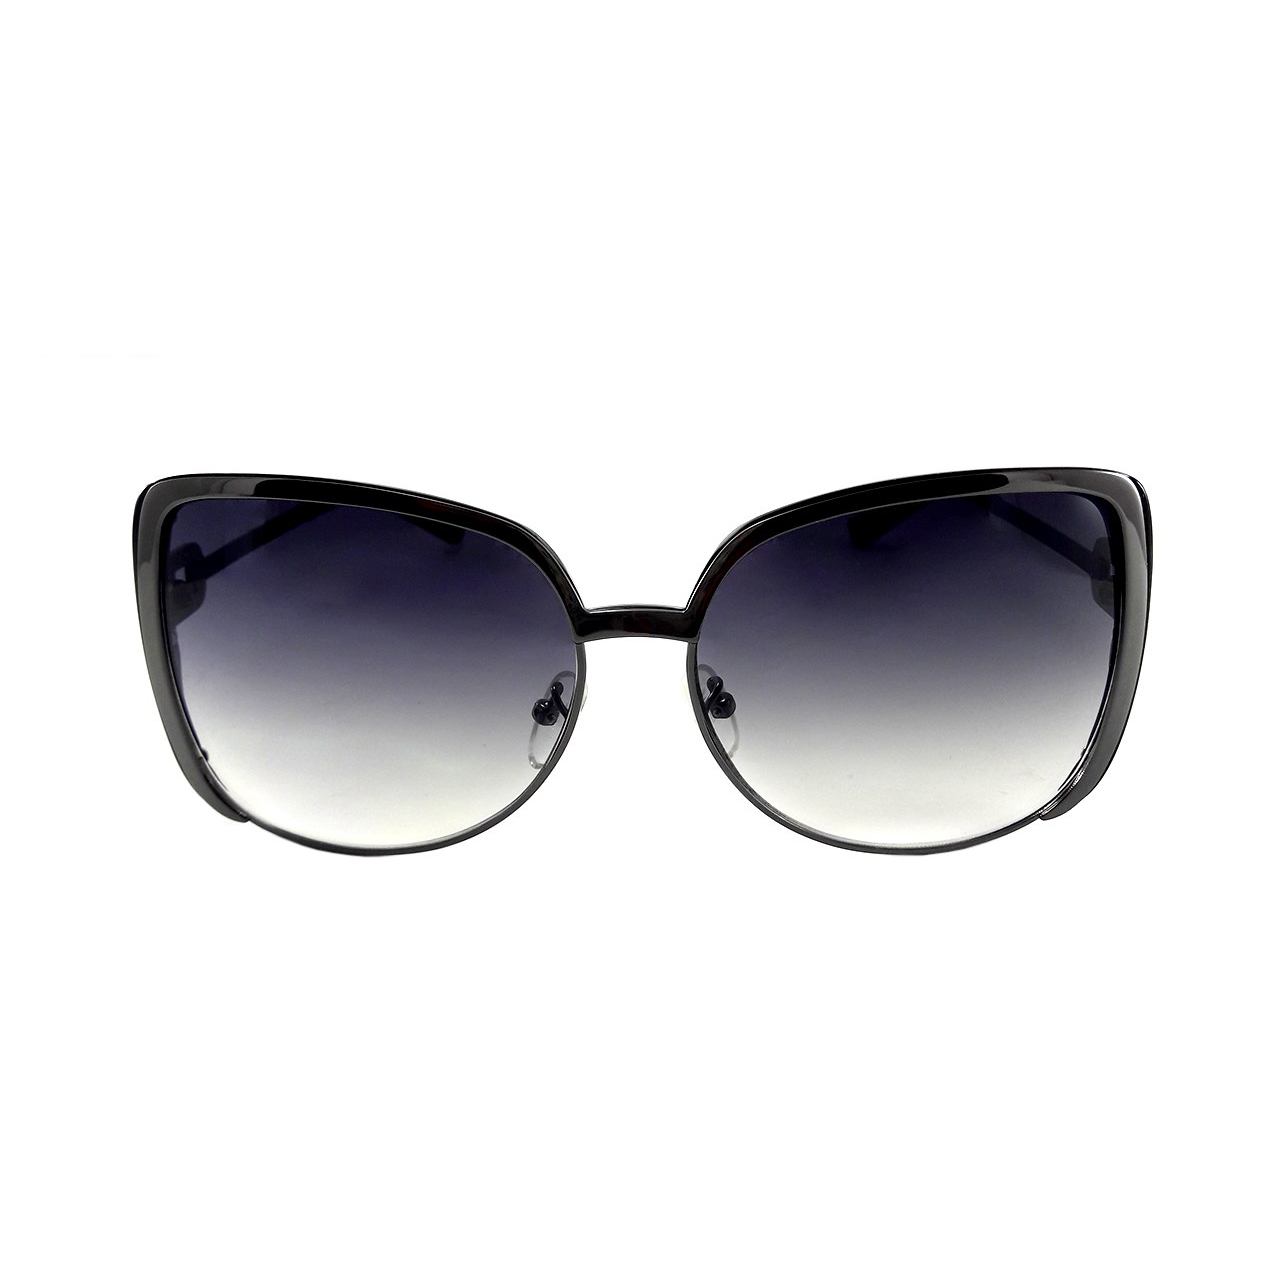 عینک آفتابی زنانه مدل long58212